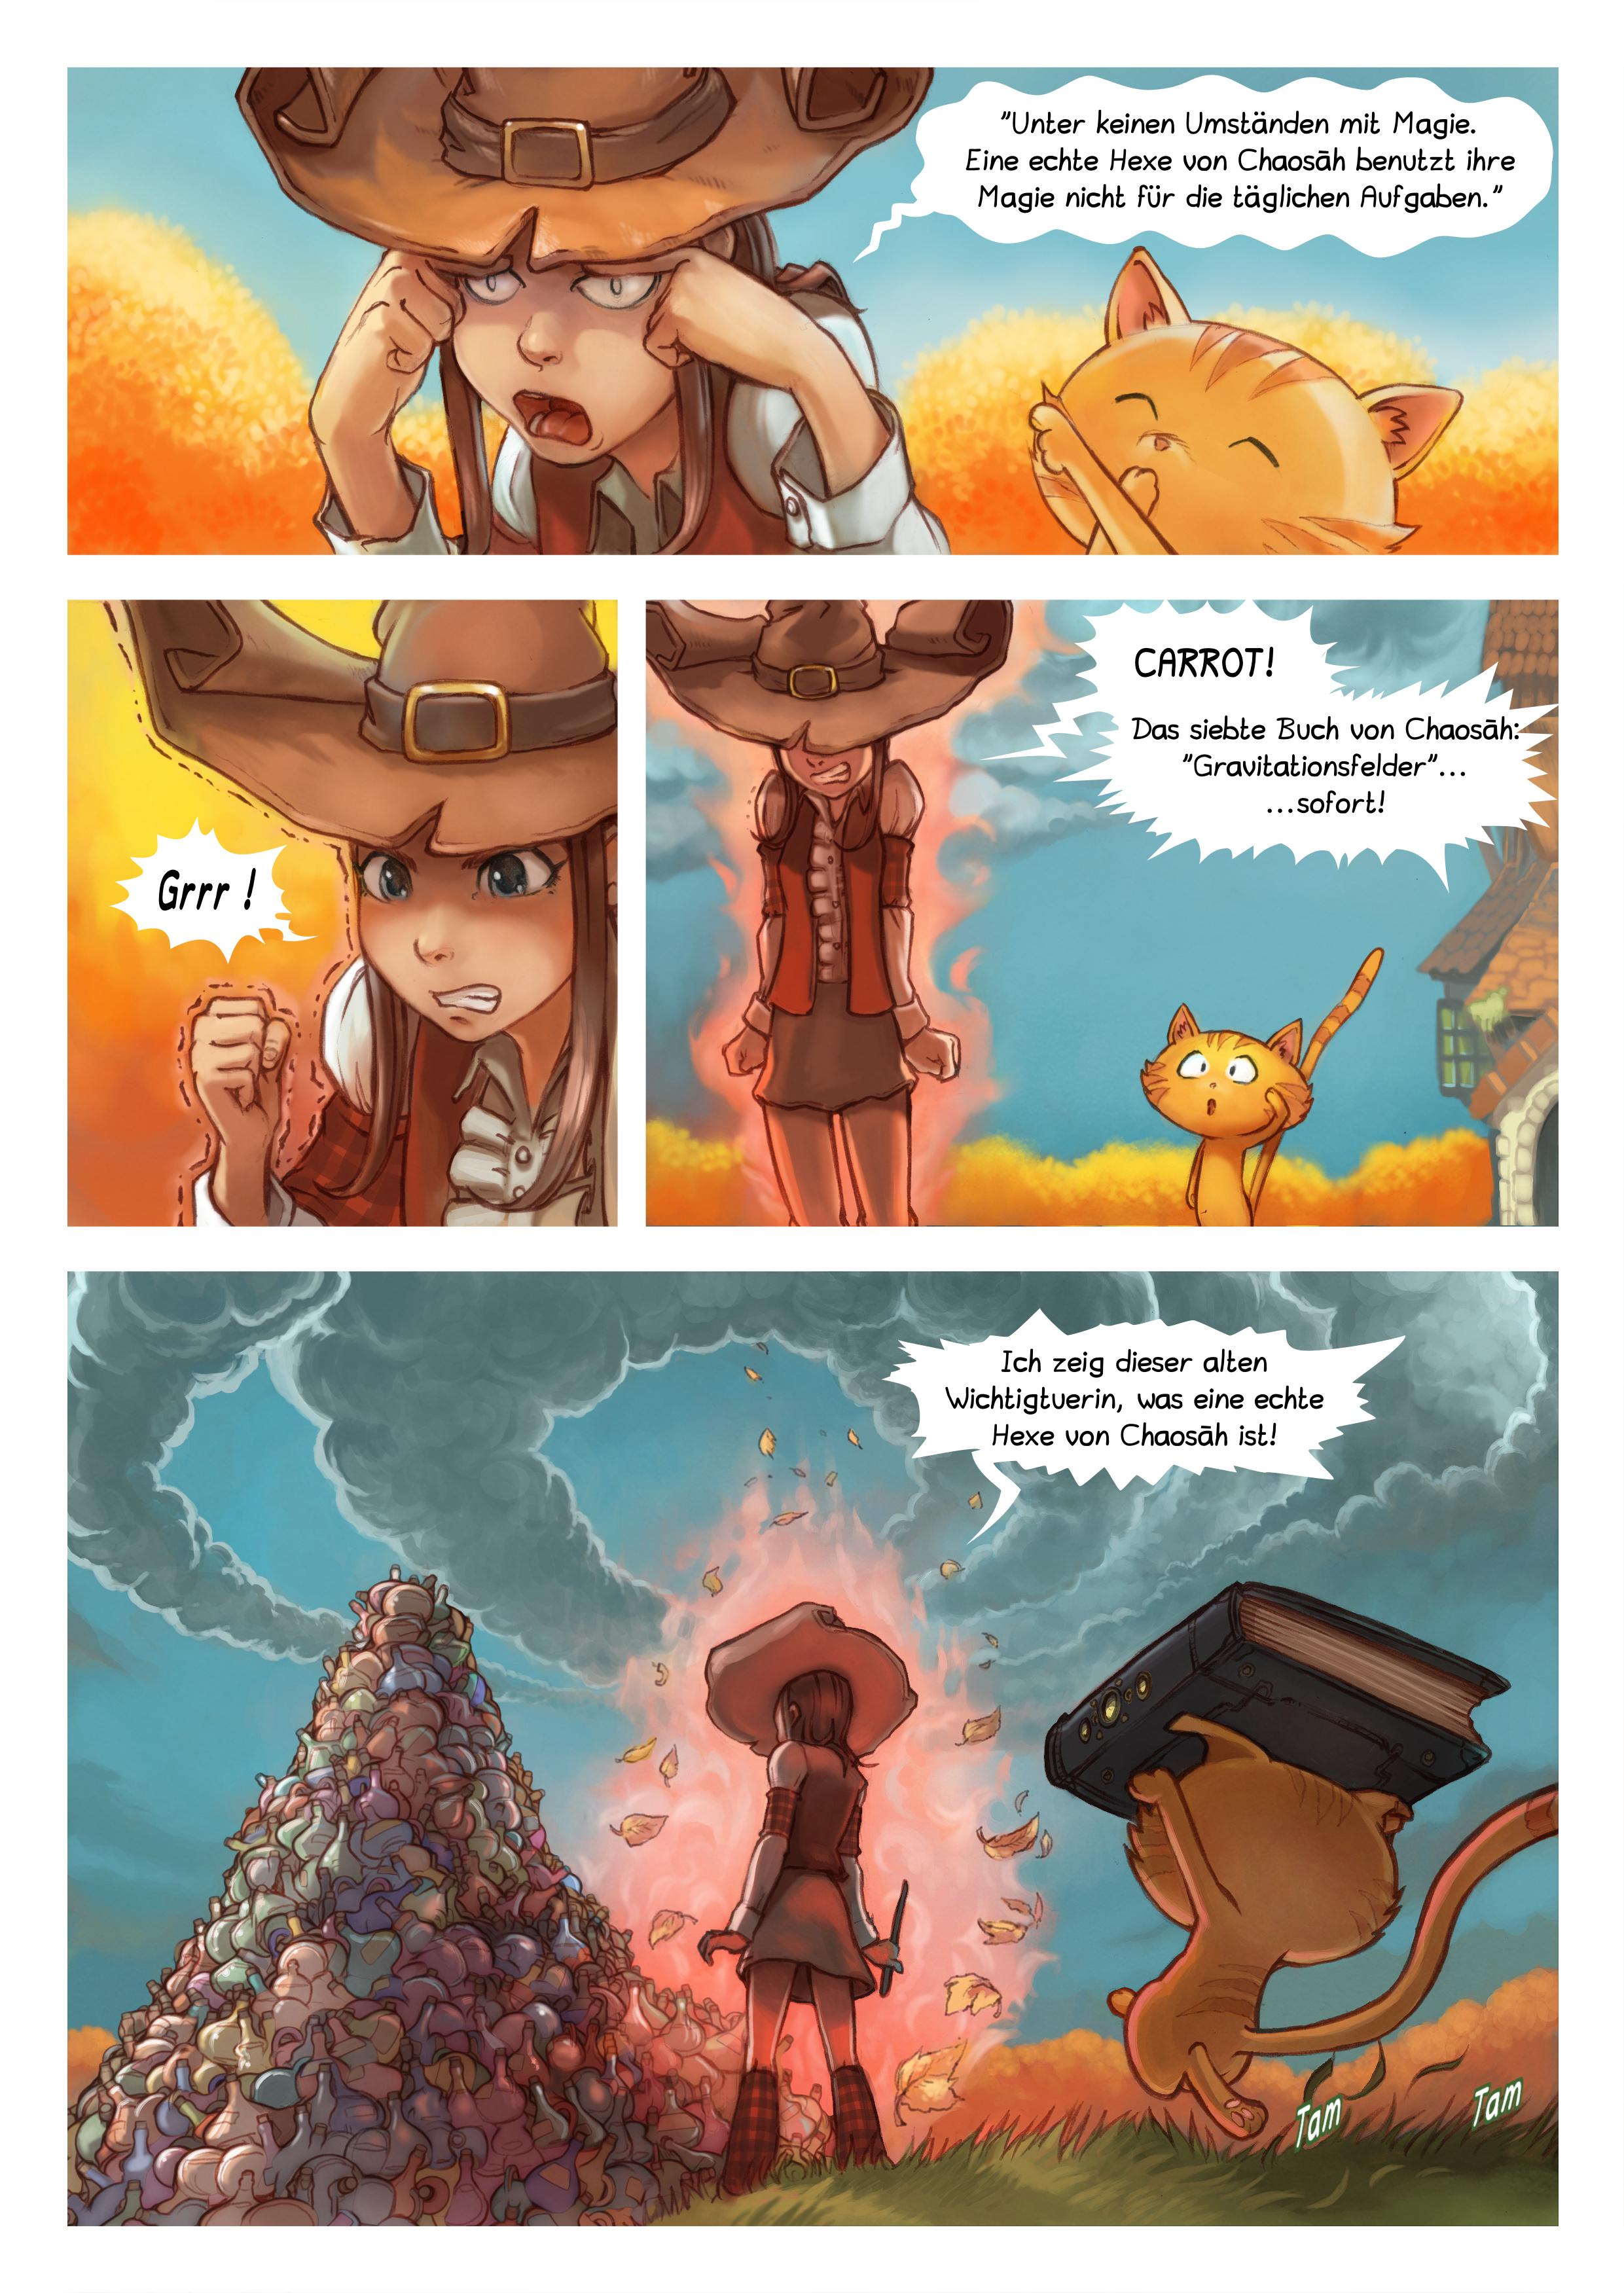 A webcomic page of Pepper&Carrot, Episode 12 [de], Seite 3